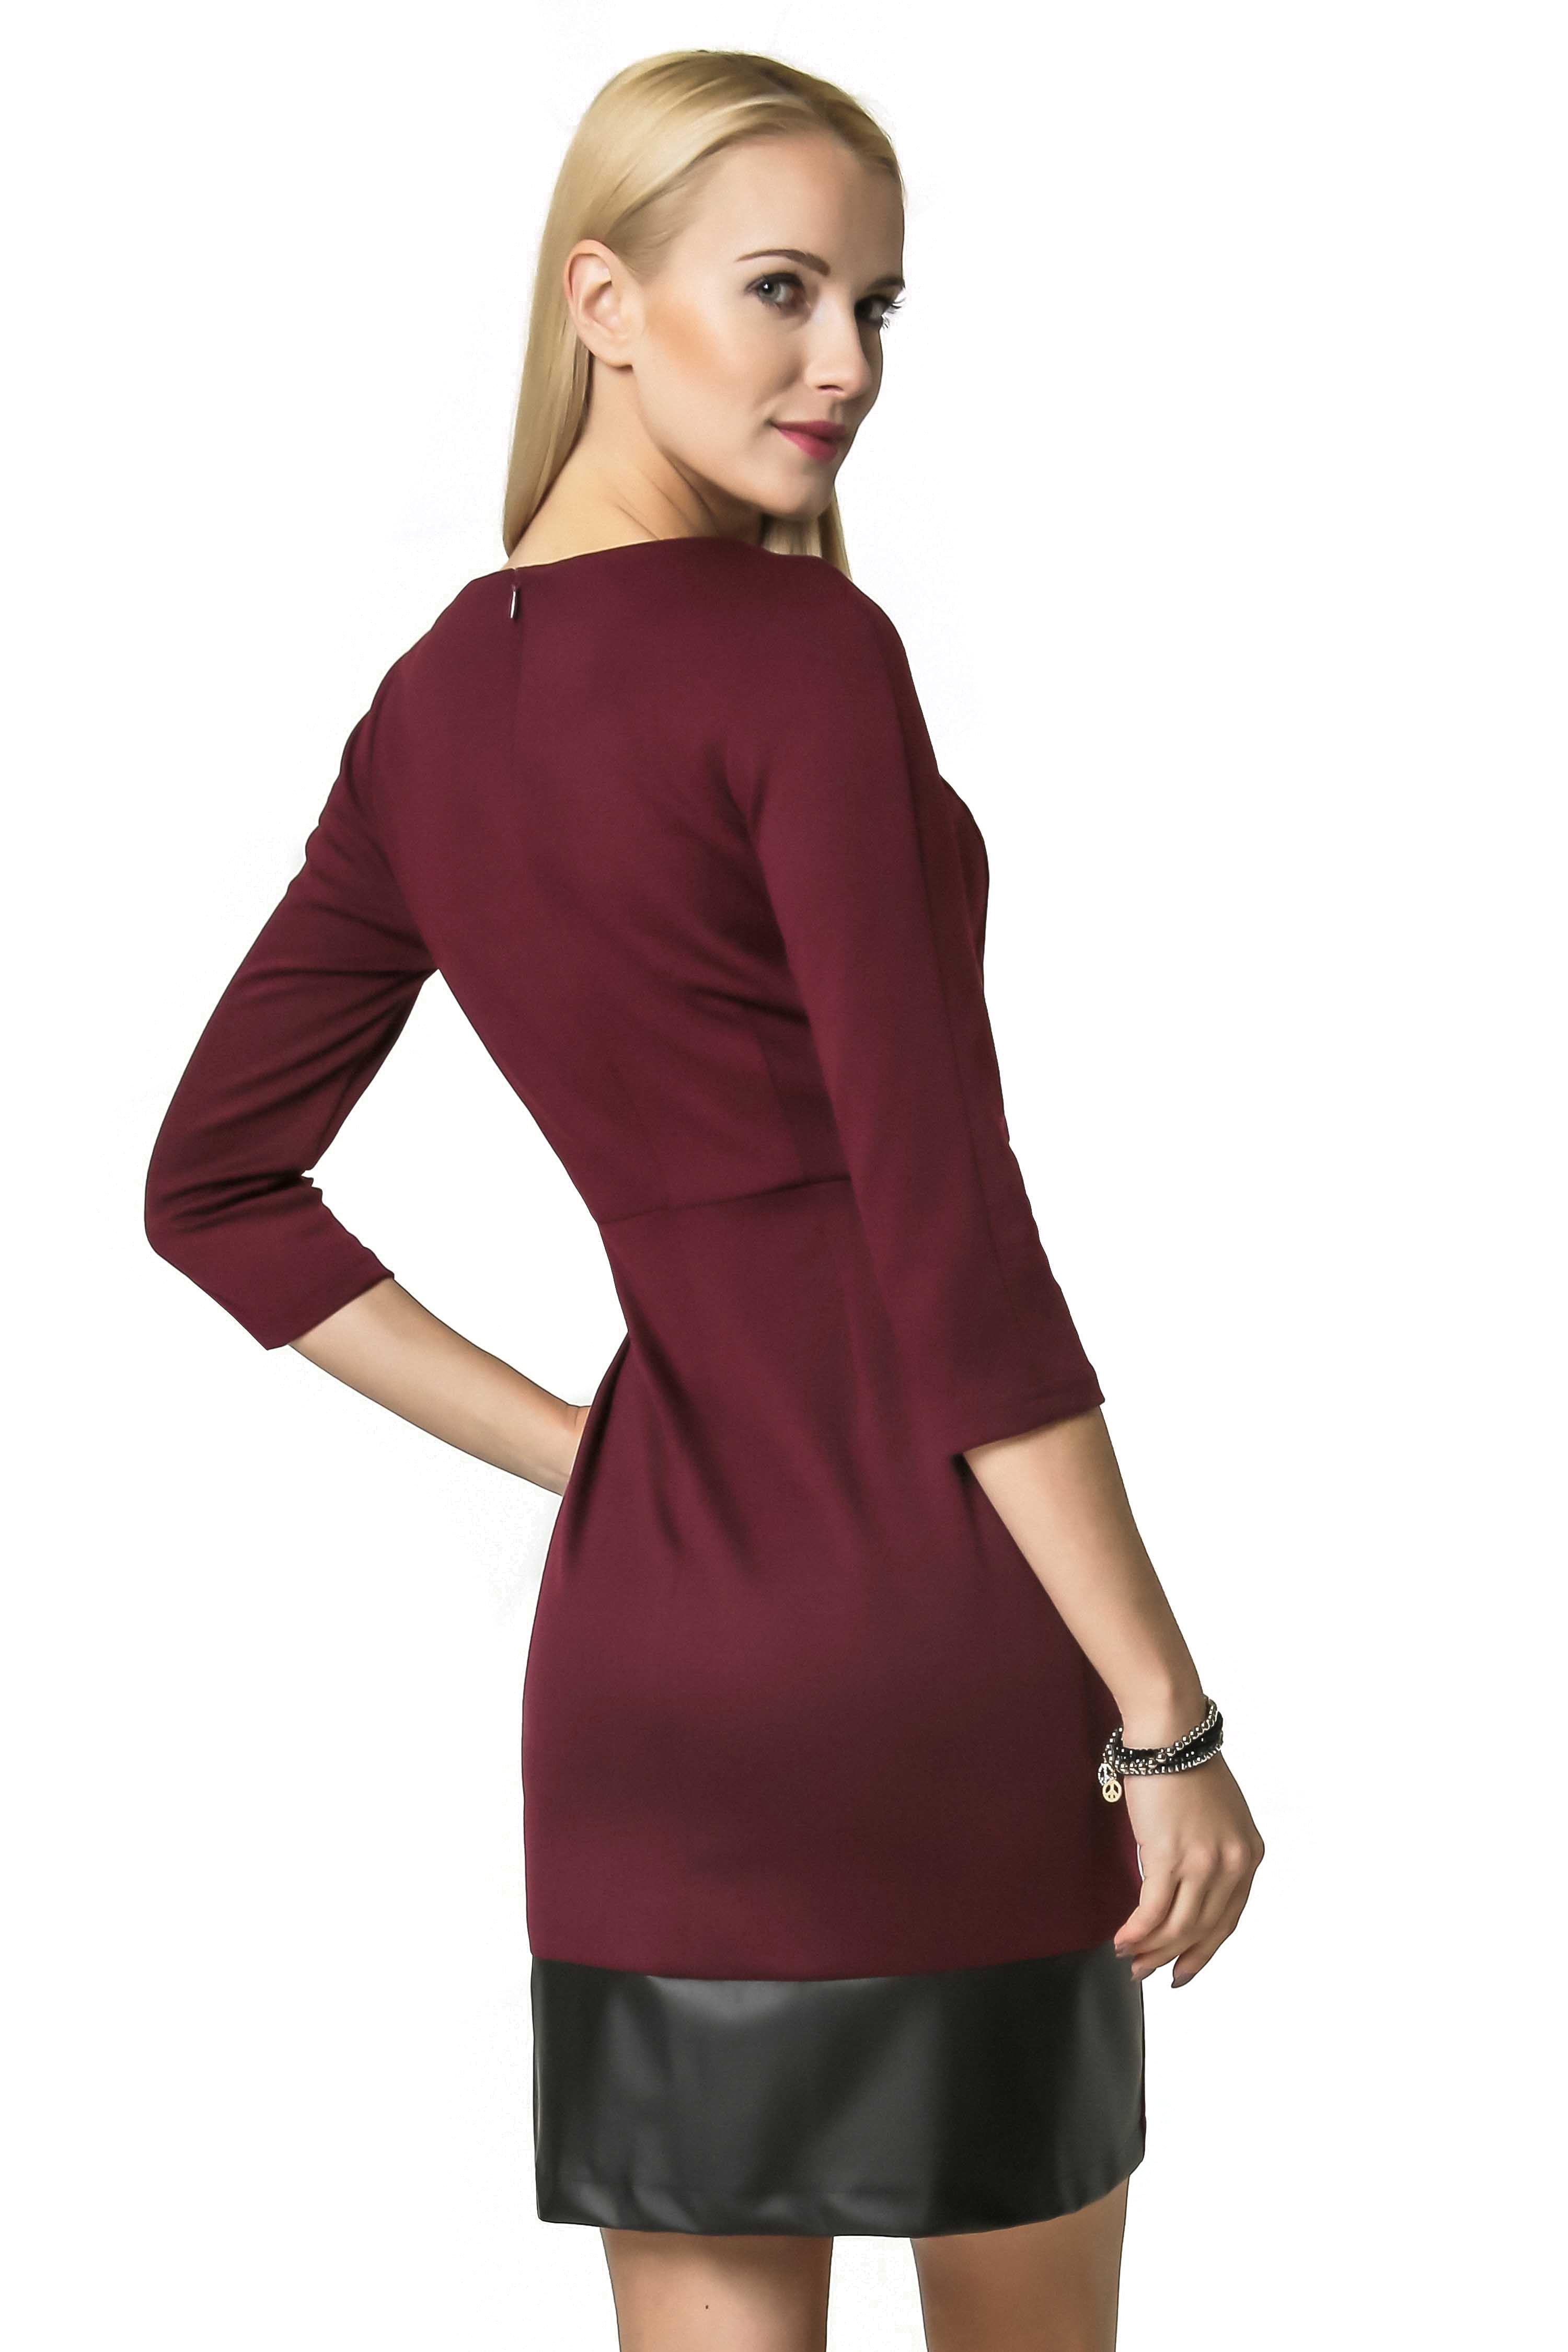 Mira dress in burgundy